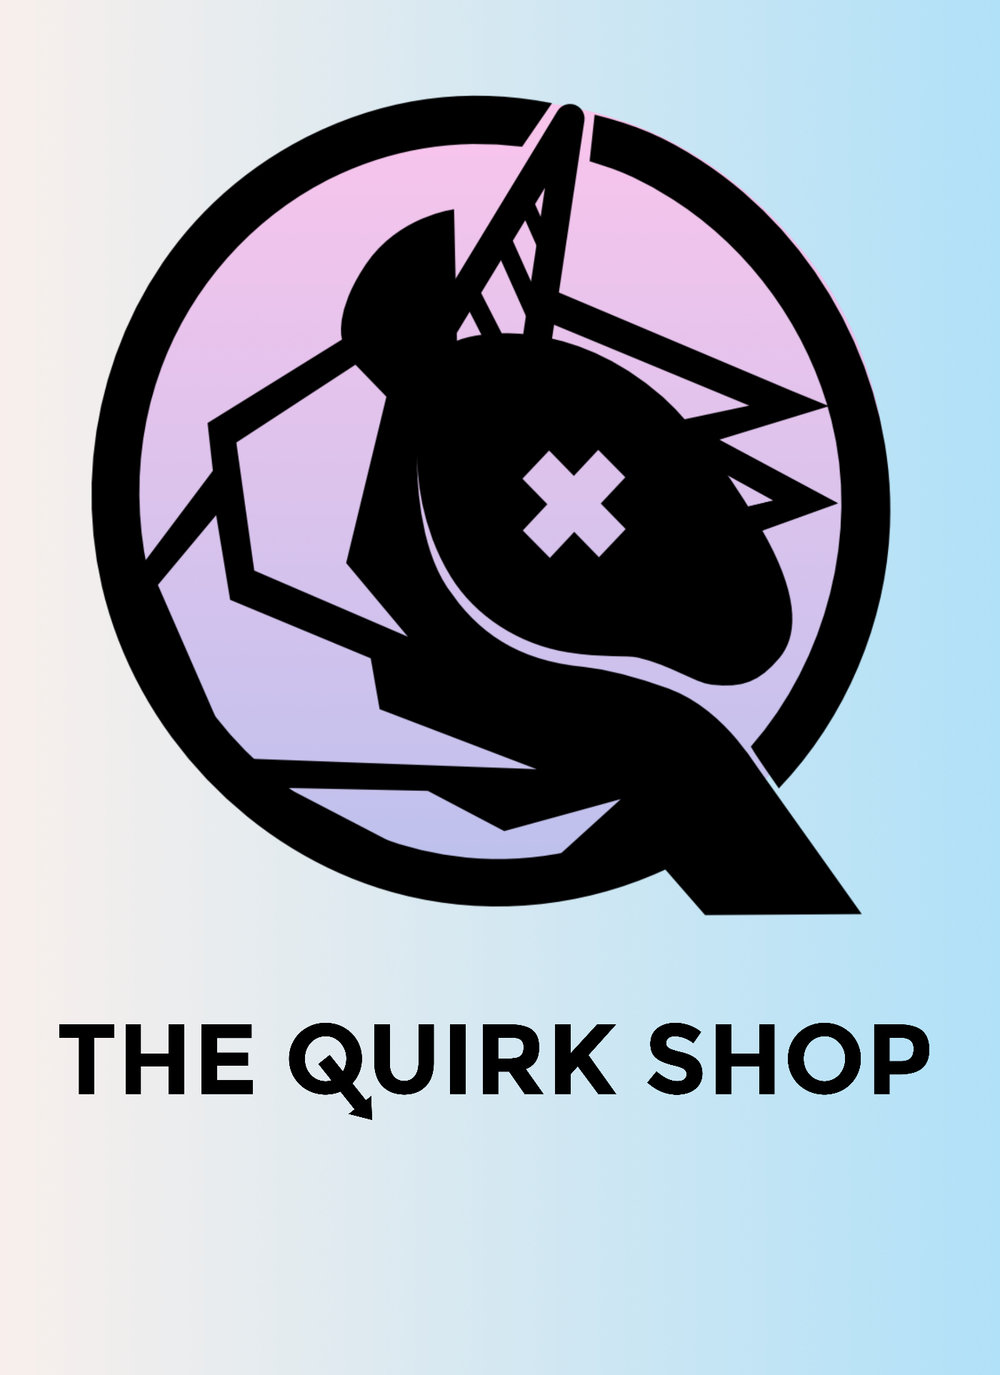 qc-thequirkshop.jpg